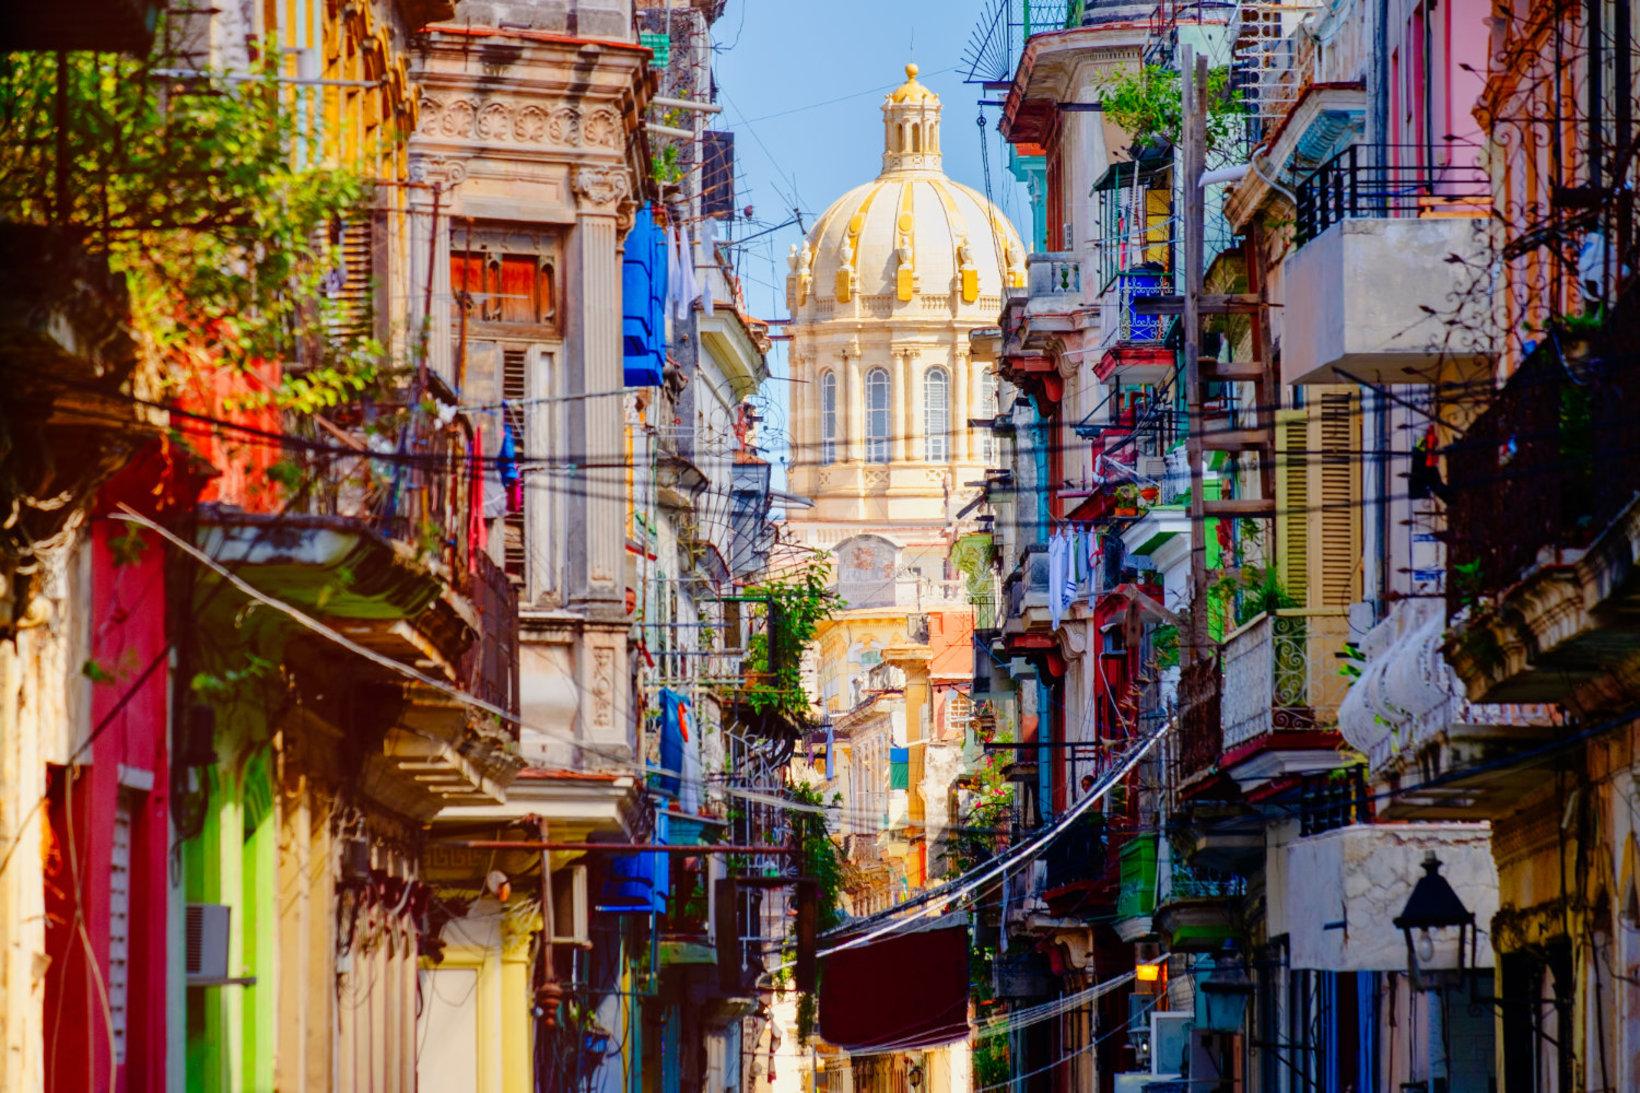 Vivez la magie de La Havane